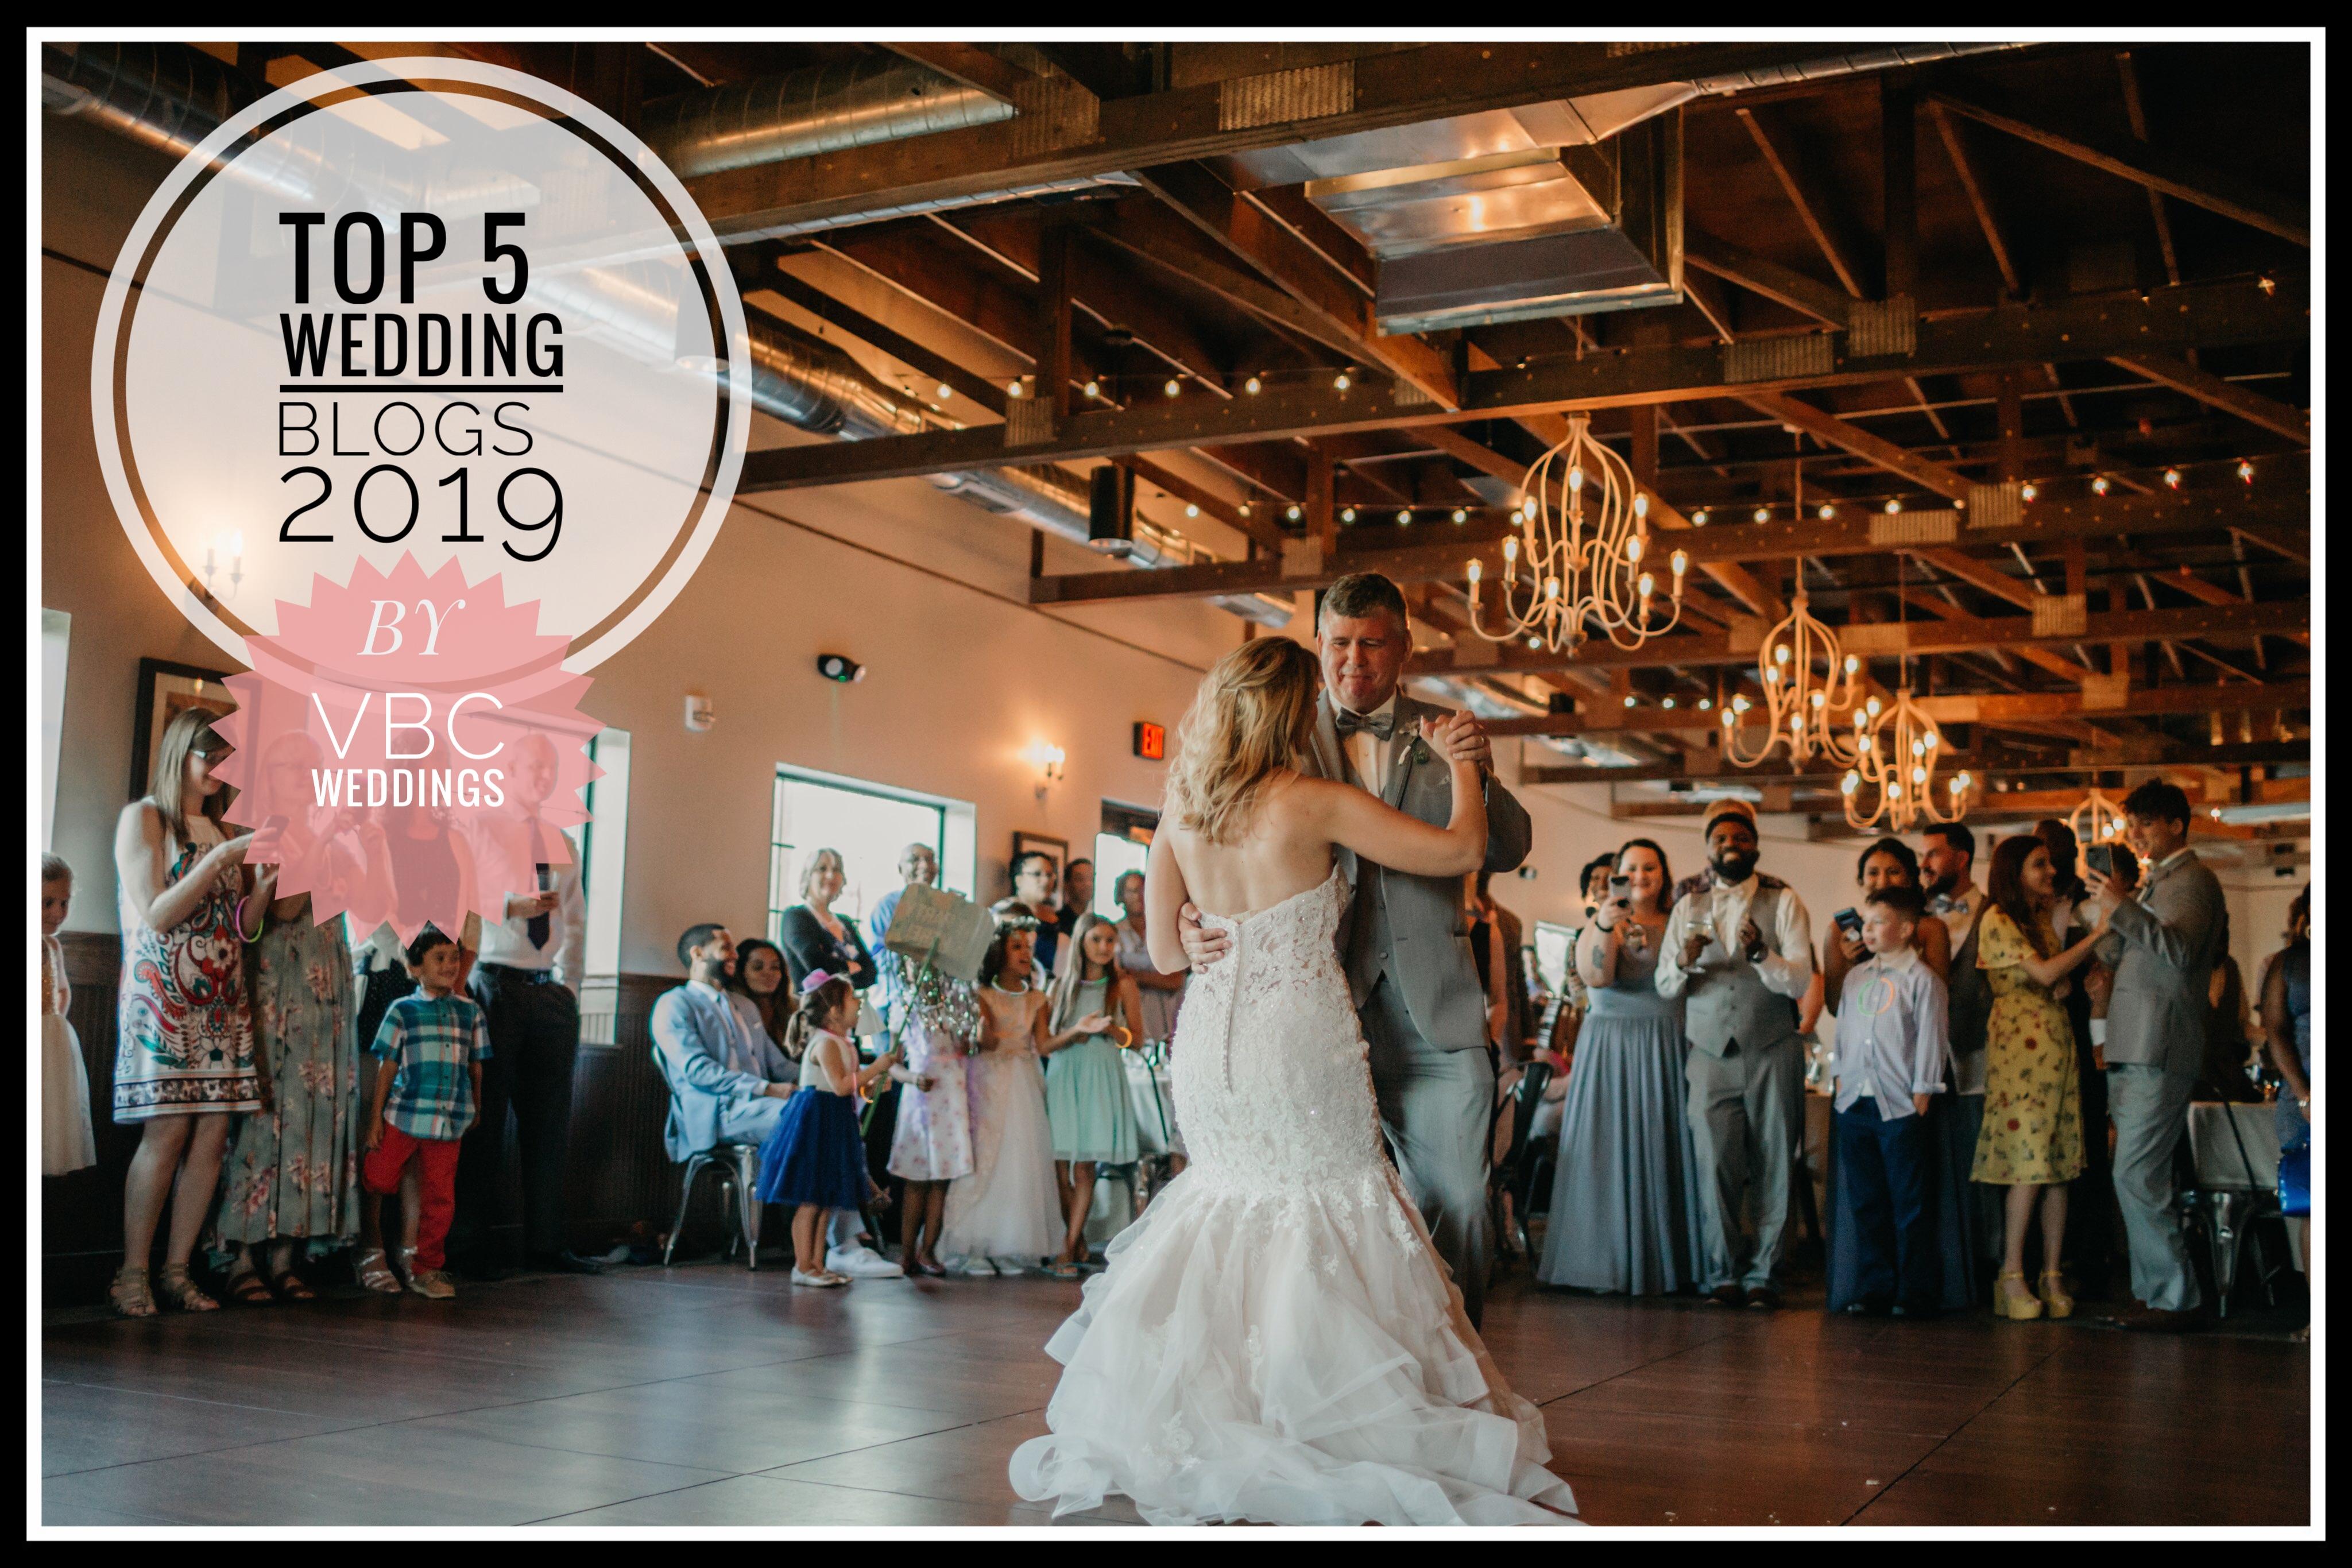 Top 5 Wedding Blogs to Follow For Wisconsin Couples, according to VBC  Weddings - Vintage Brewing Company - Sauk Prairie